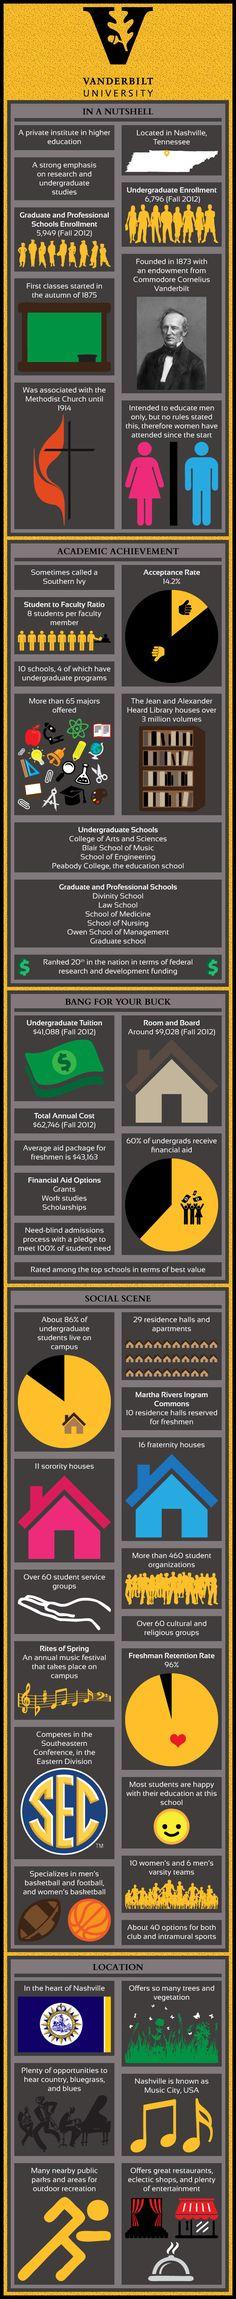 Vanderbilt University Infographic gives information on the US University admissions, schools, programs, fees etc College List, College Hacks, College Loans, Usa University, Vanderbilt University, Dream School, I School, Liberal Arts College, College Search